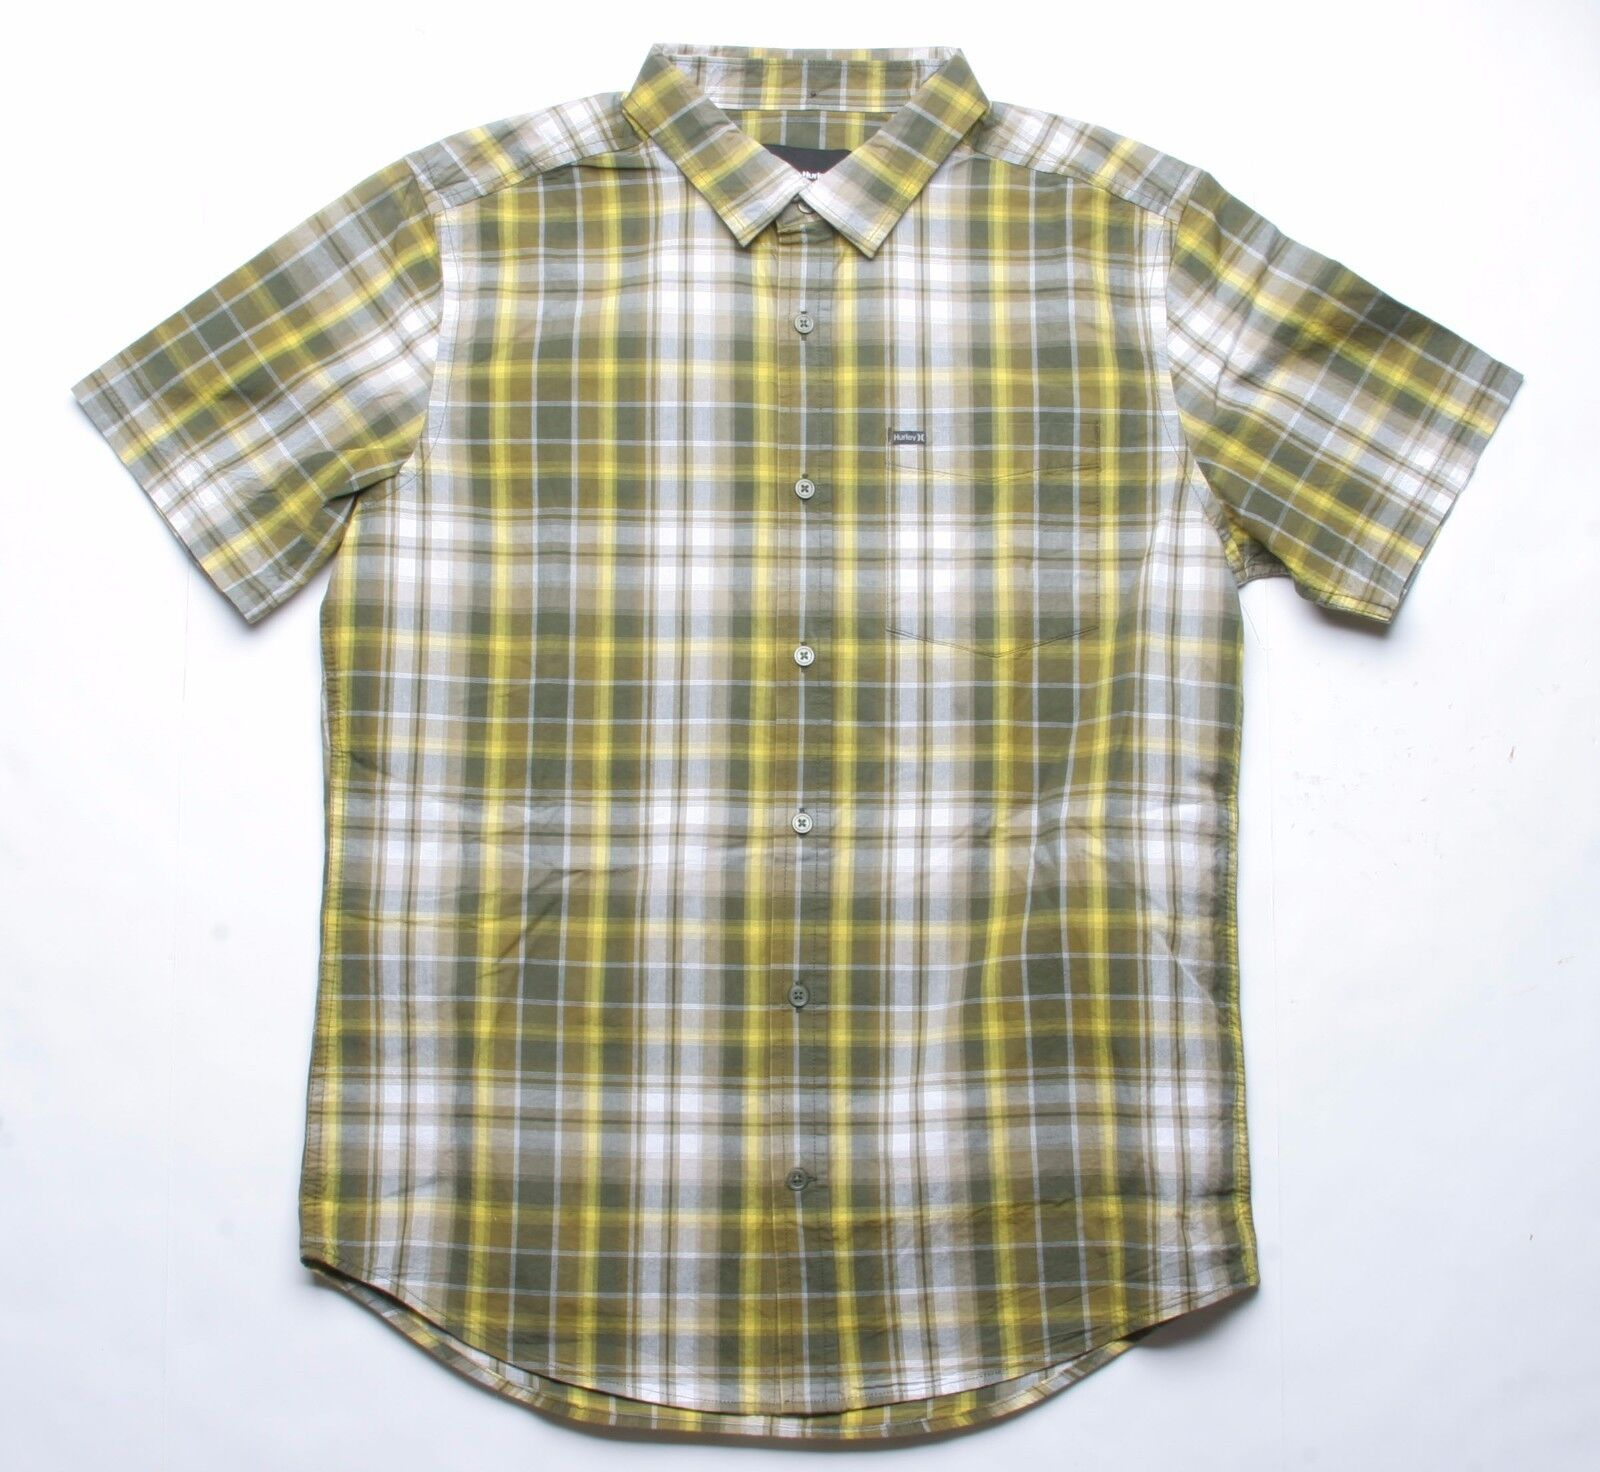 Hurley Havoc Short Sleeve Plaid Woven Shirt (Green) M